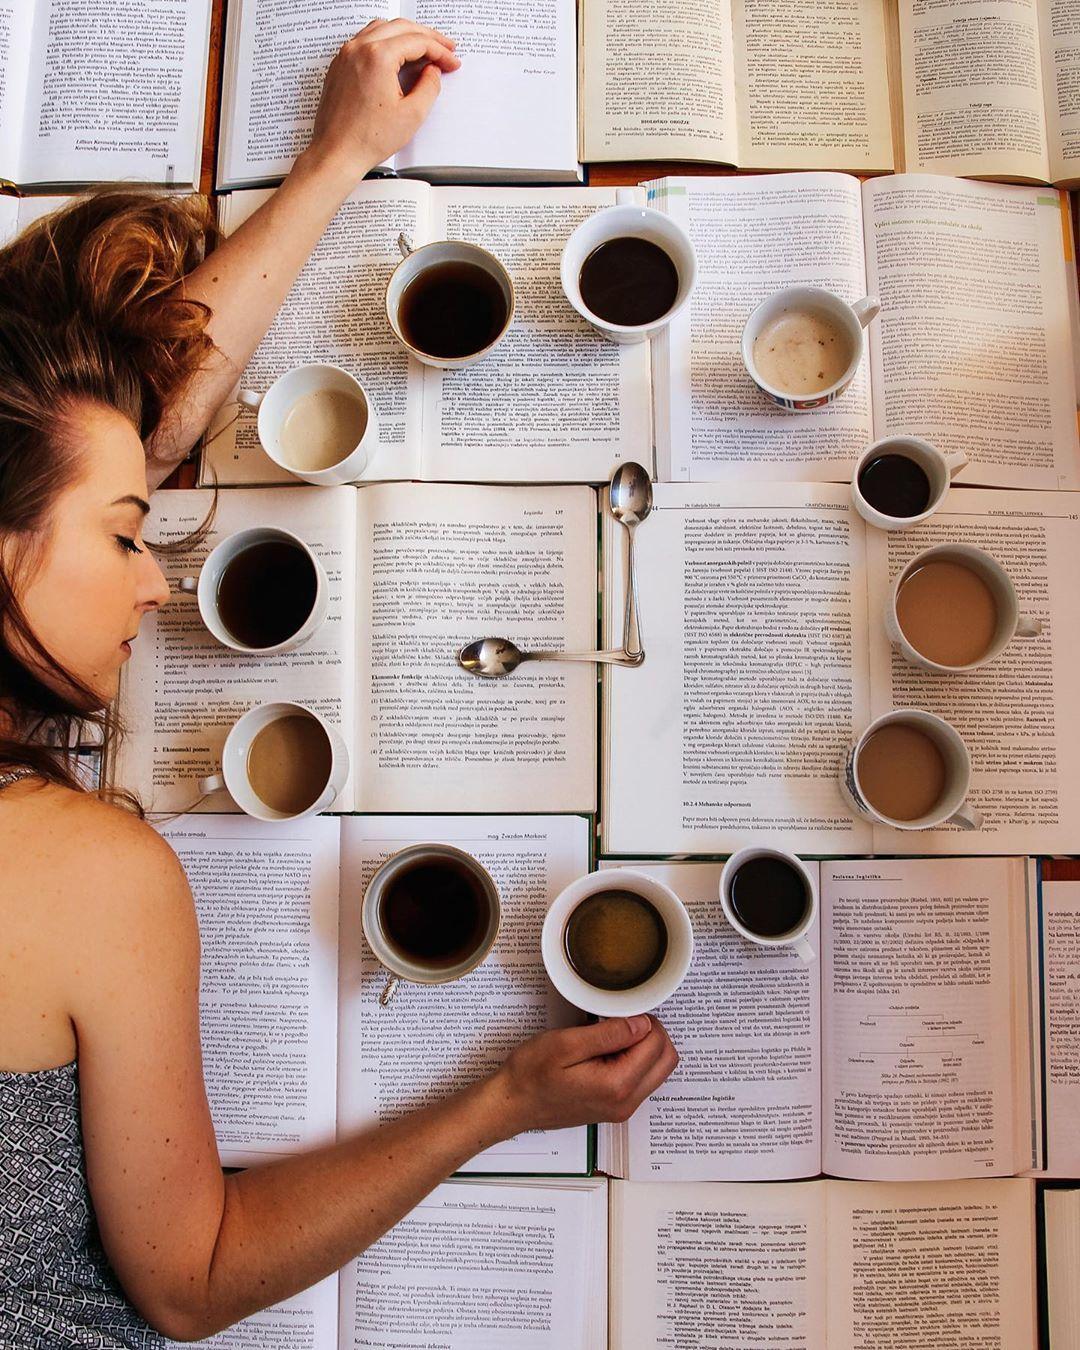 Bela kava, tuška kava, espresso, cappuchino, macchiato, latte macchiato … ☕️ Sama sicer nisem ljubiteljica kave, pa vendar se v težkih trenutkih pokaže, da je to ena od osnovnih potreb človeškega srca. . . . #coffee #coffeeoclock #clock #cup #spoon #book #books #literature #study #writing #mastersdegree #tired #sleep #nosleep #allday #allnight #goodmorning #goodnight #lattemacchiato